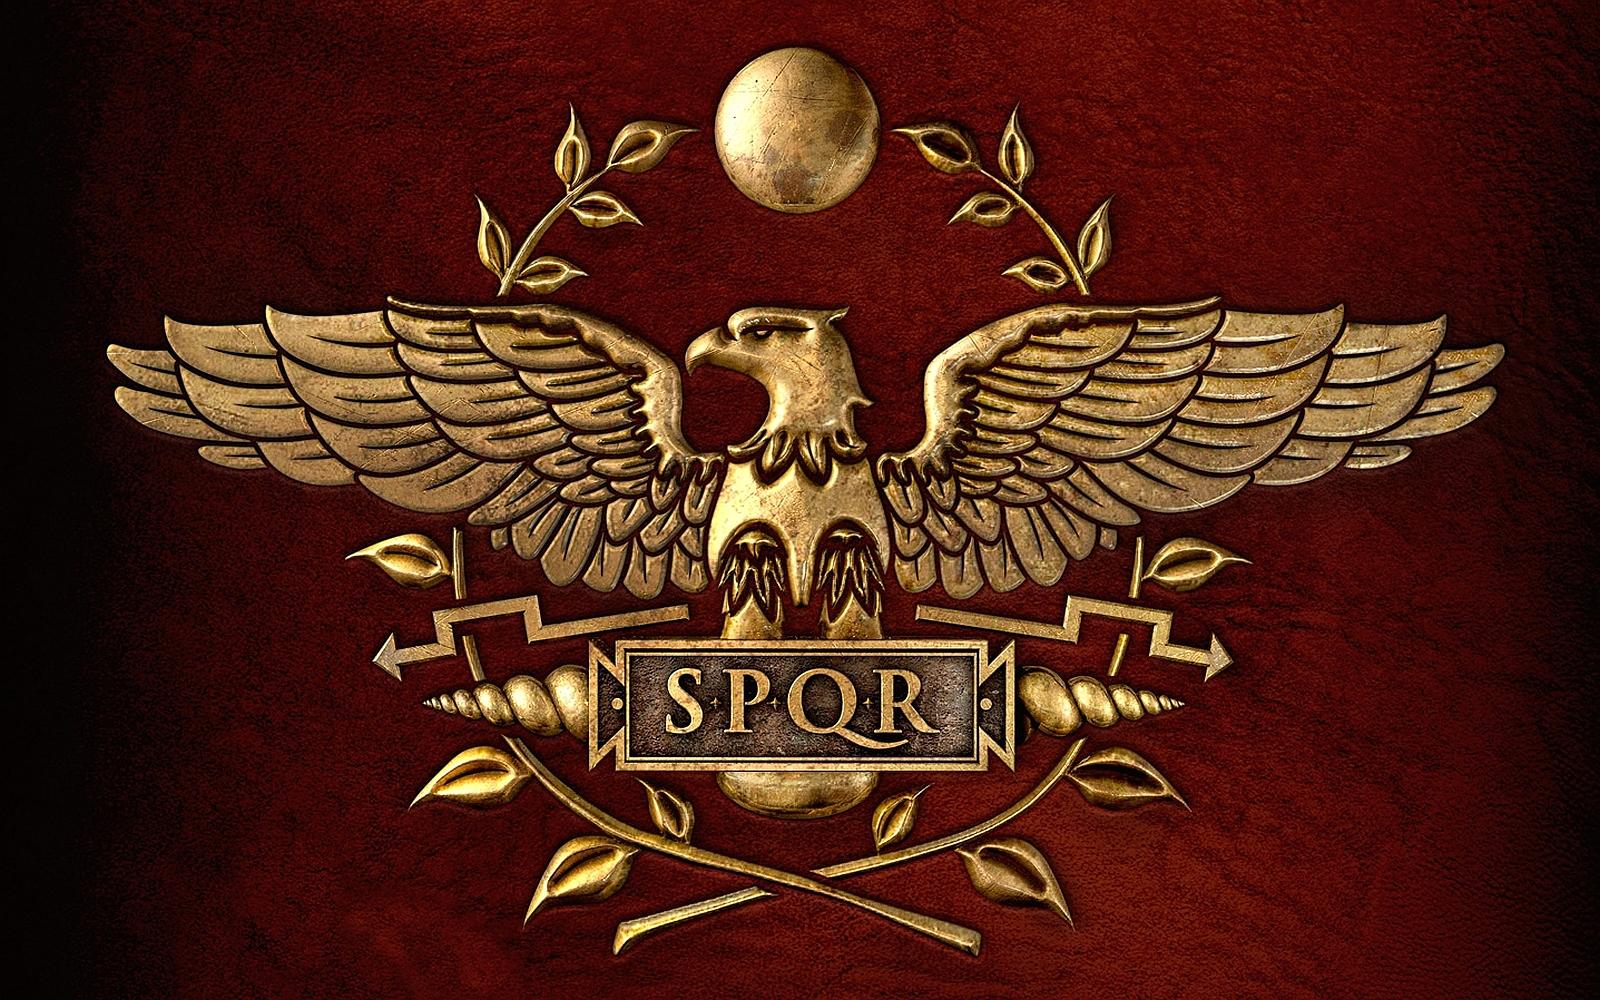 Rome Total War Wallpaper: 33 Total War: Rome II HD Wallpapers